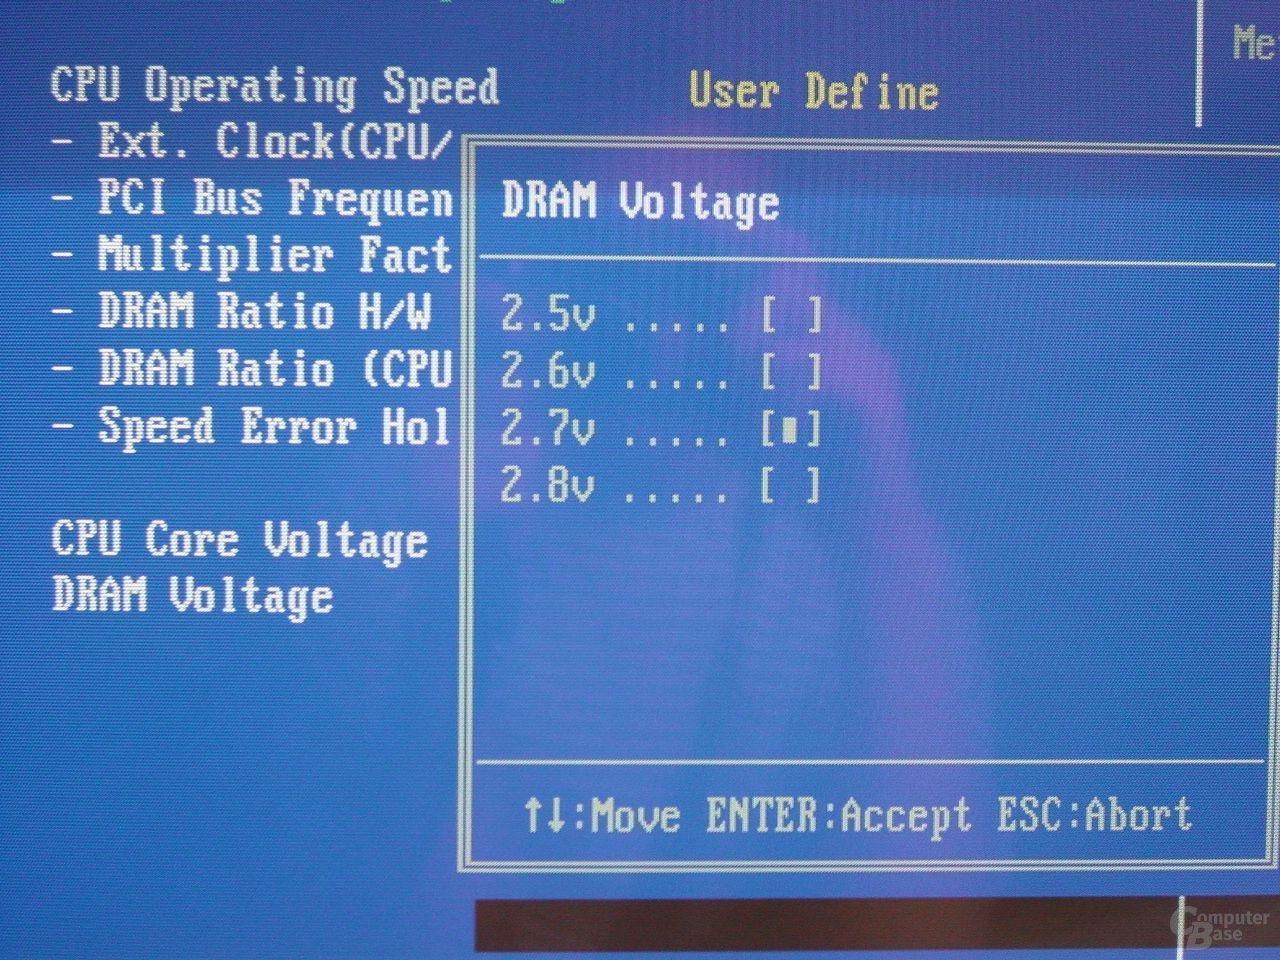 Biso - DRAM Voltage